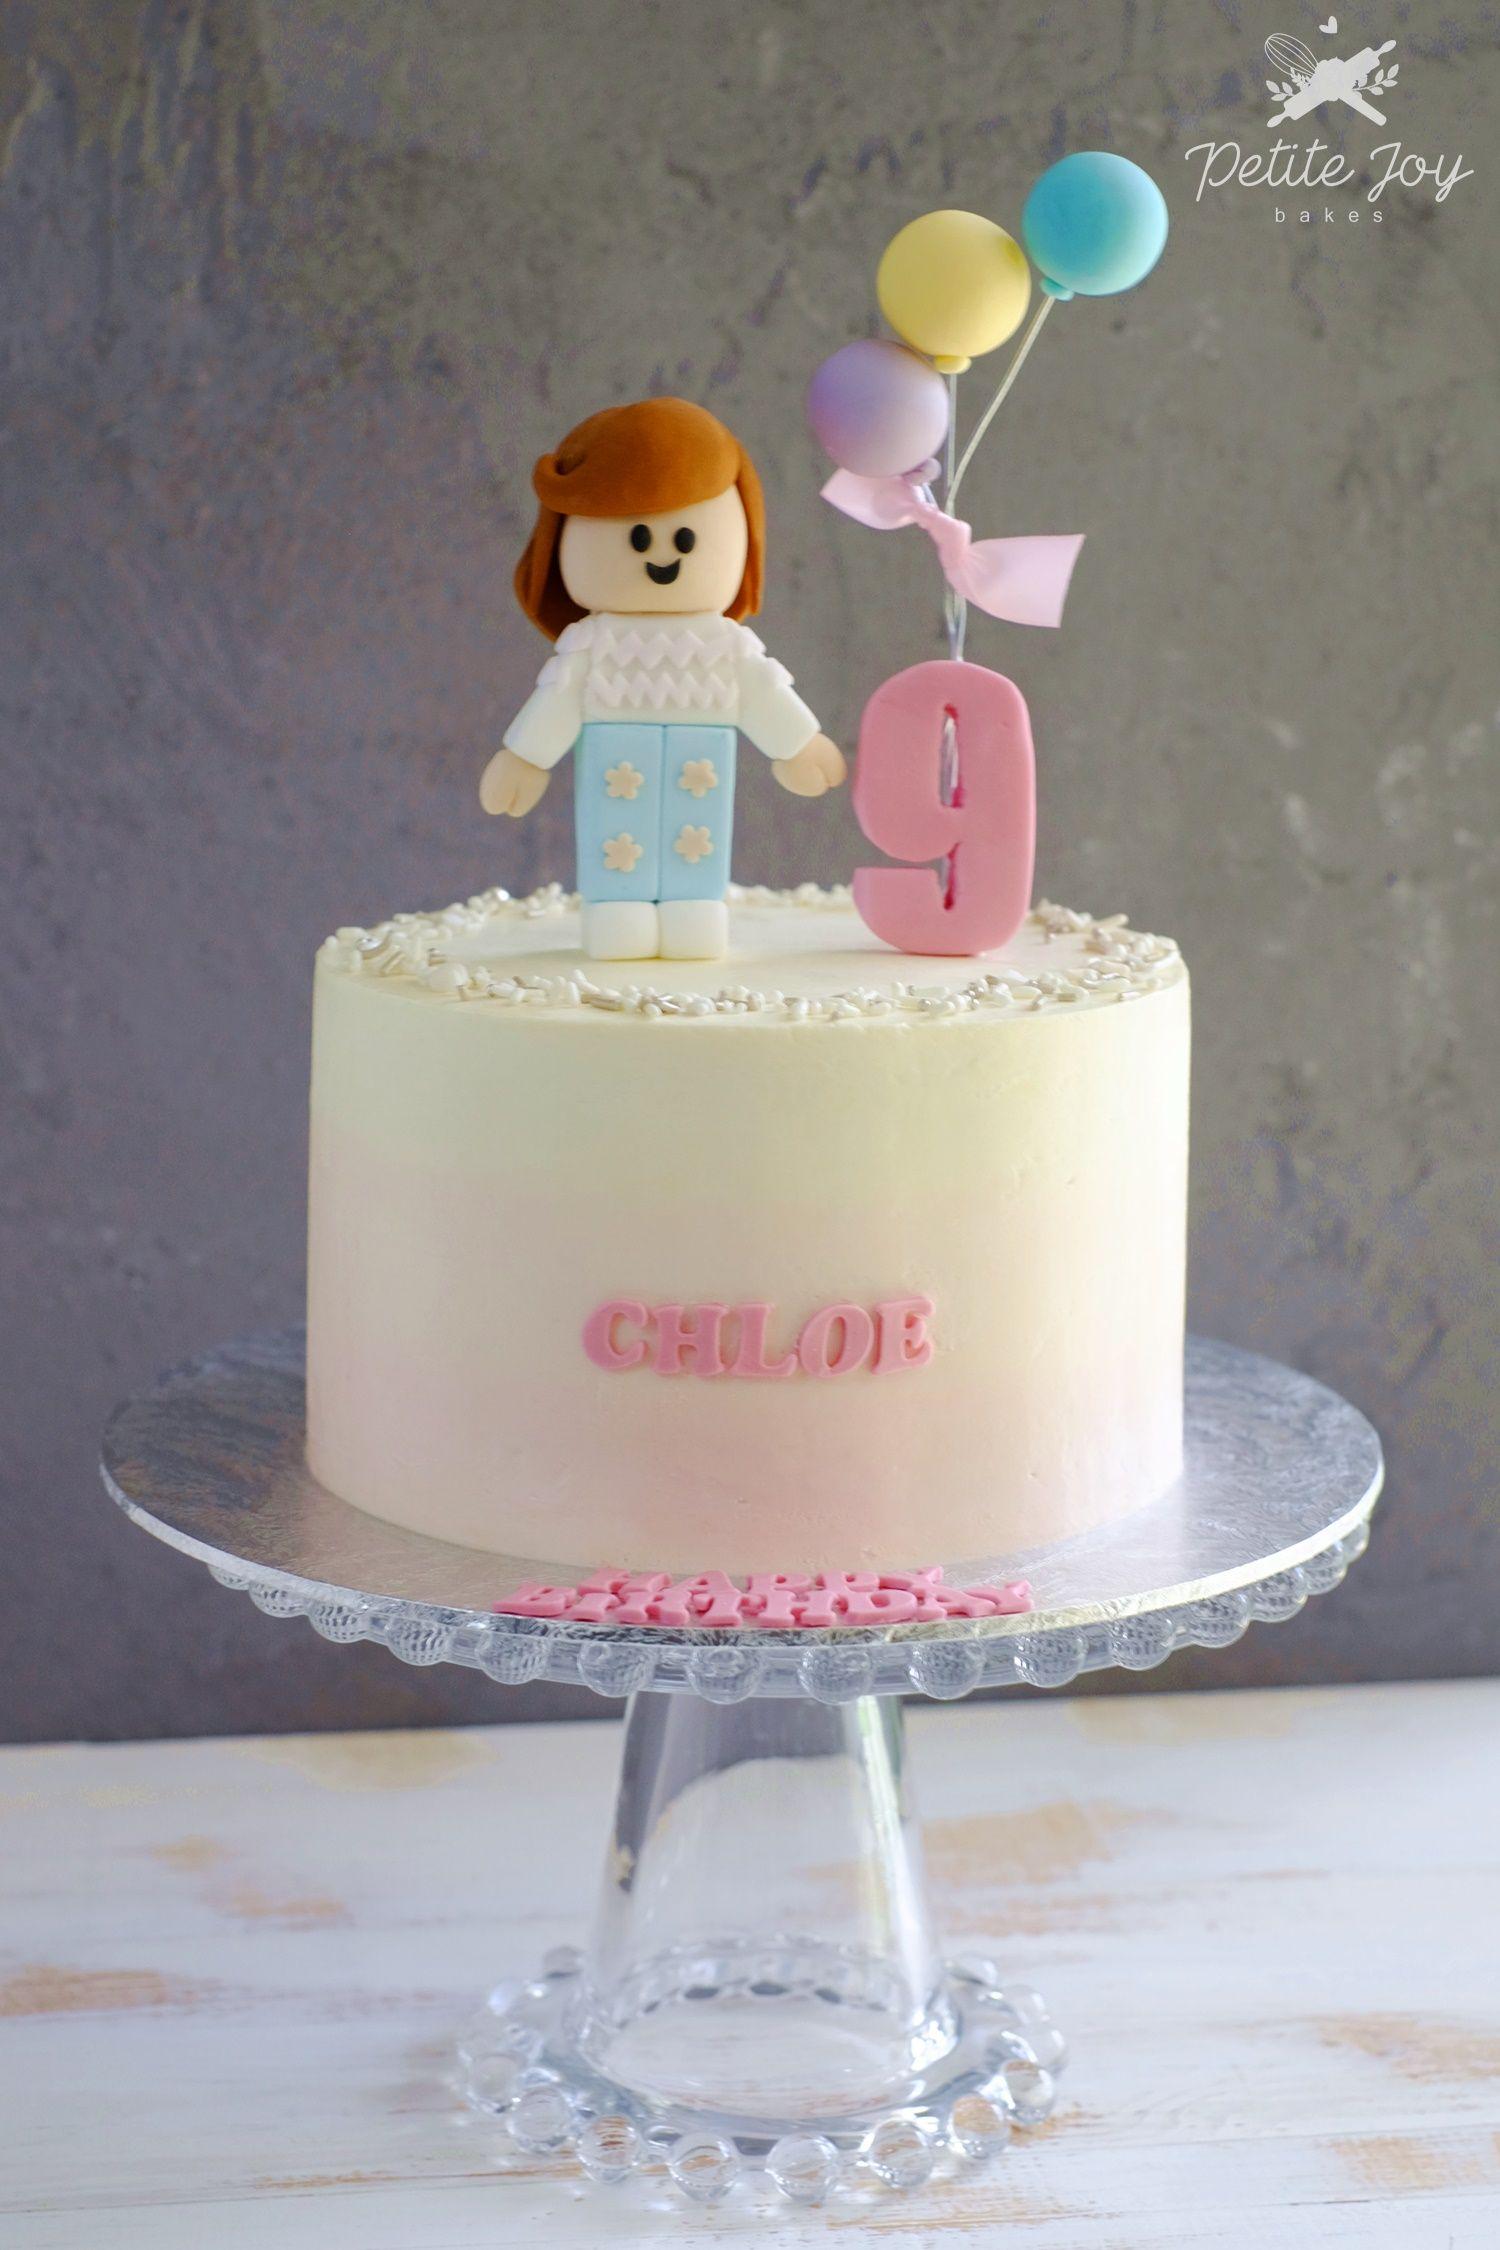 Roblox Birthday Cake Ideas Girl Roblox Girl Ombre Cake Roblox Birthday Cake Birthday Cake Girls Themed Cakes